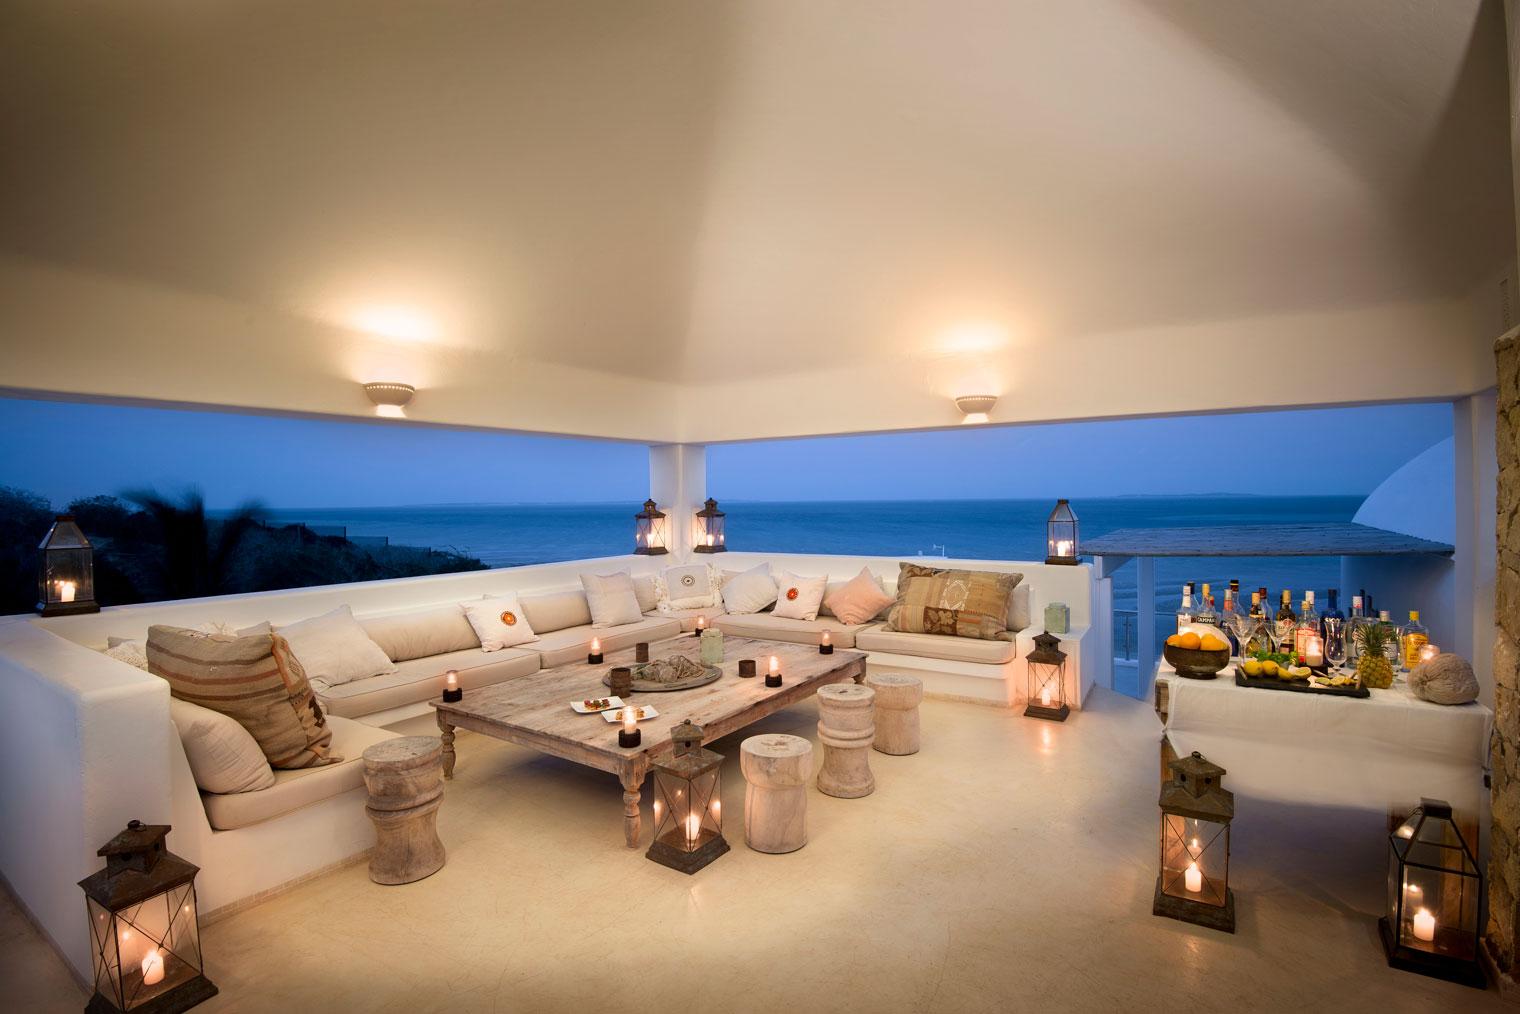 Santorini-Mozambique-Main-Area-Deck